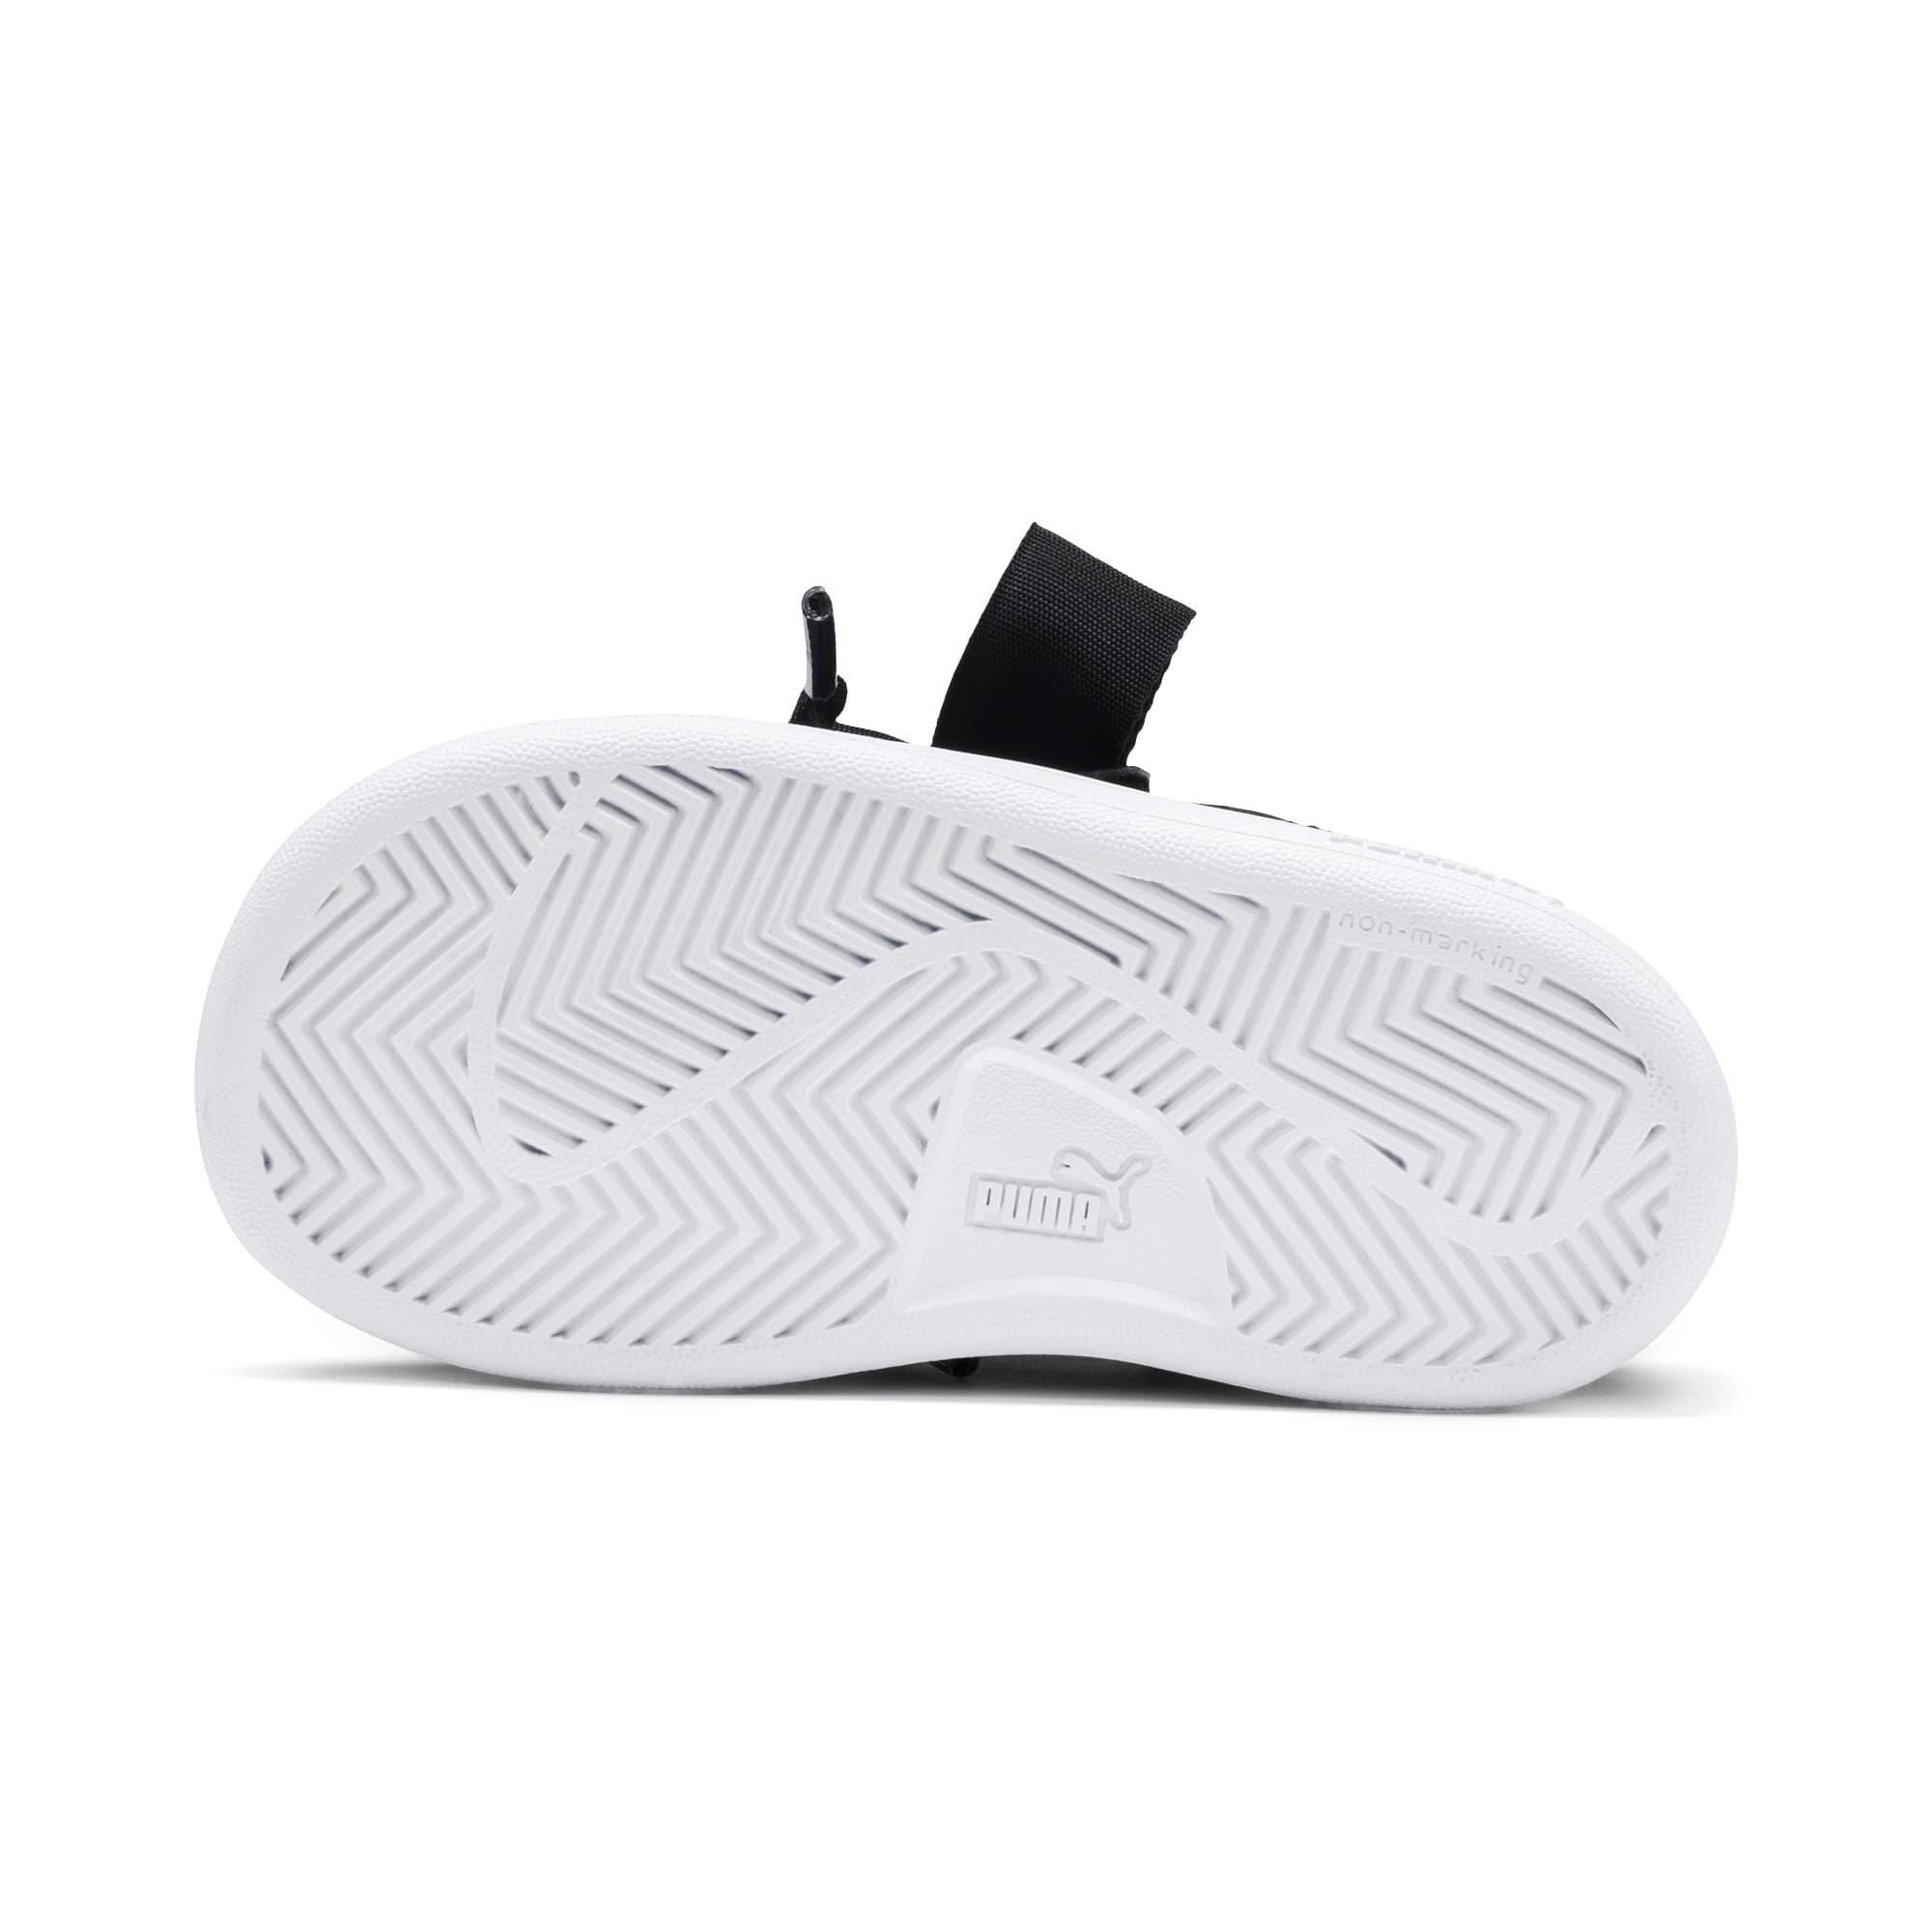 Thumbnail 4 of PUMA Smash v2 Patent Buckle AC Toddler Shoes, Puma Black-Puma Silver-White, medium